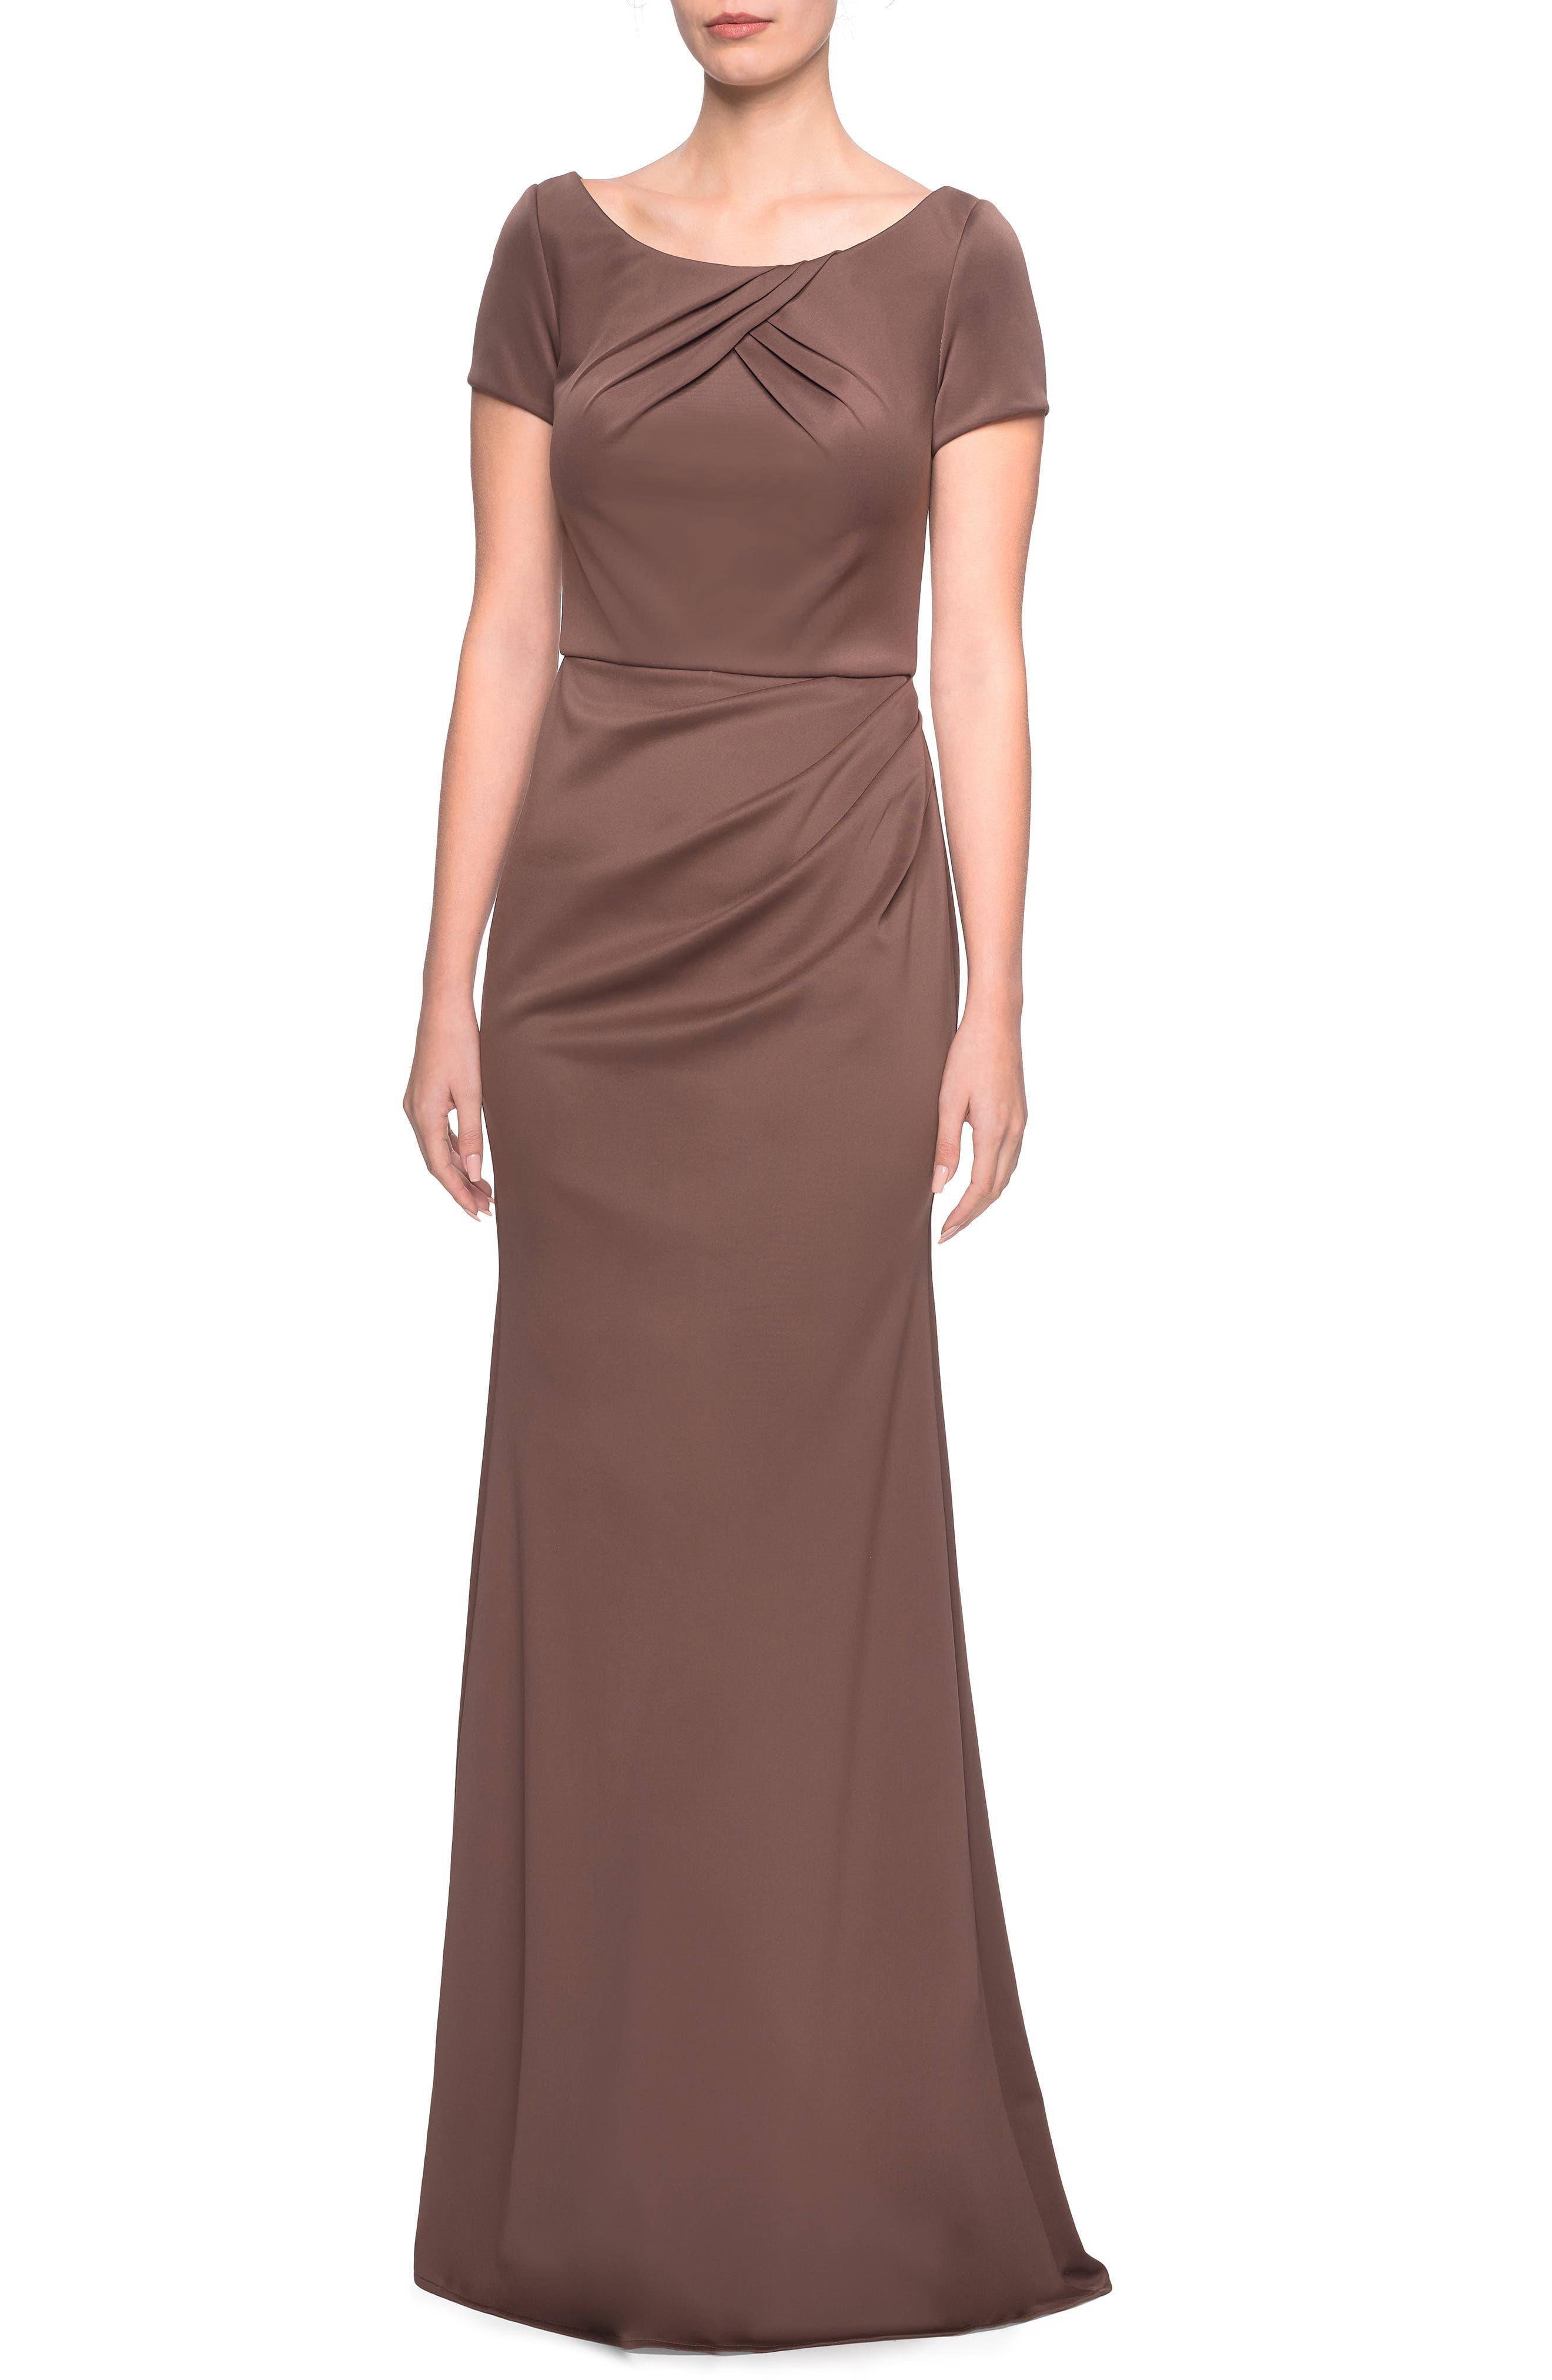 La Femme Ruched Detail Soft Jersey Evening Dress, Brown